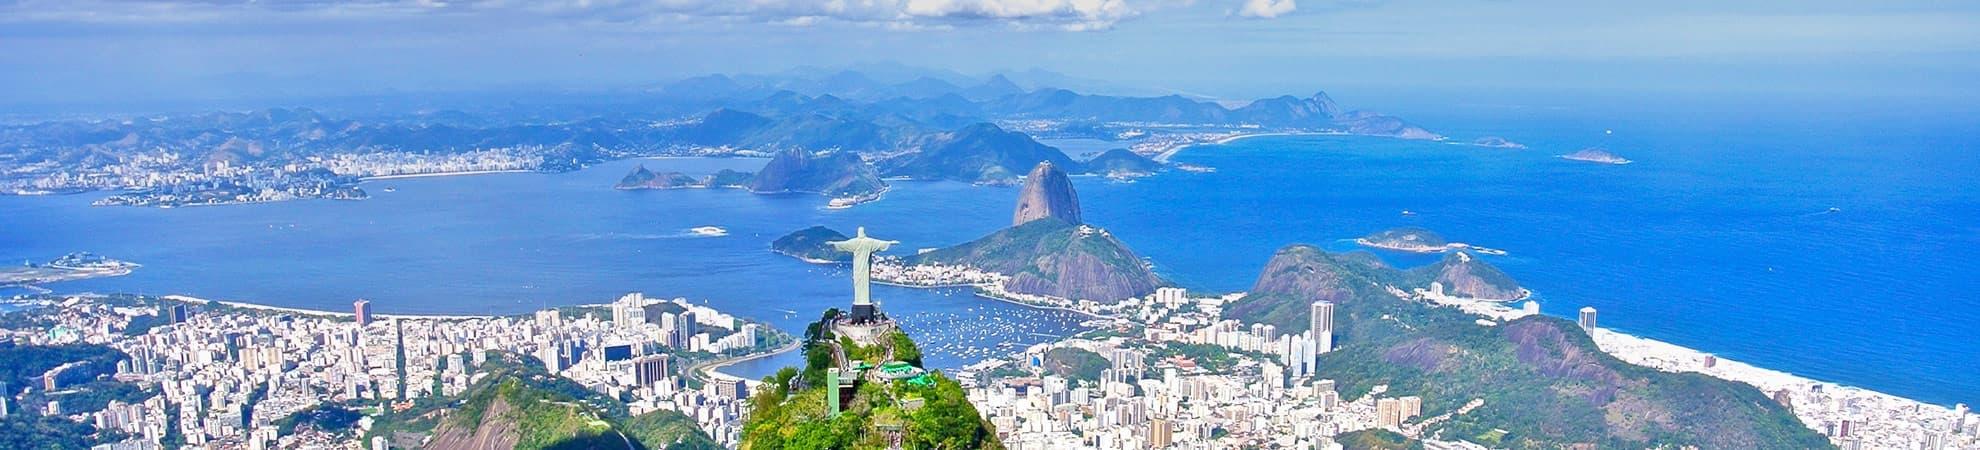 Séjour inoubliable à São Paulo